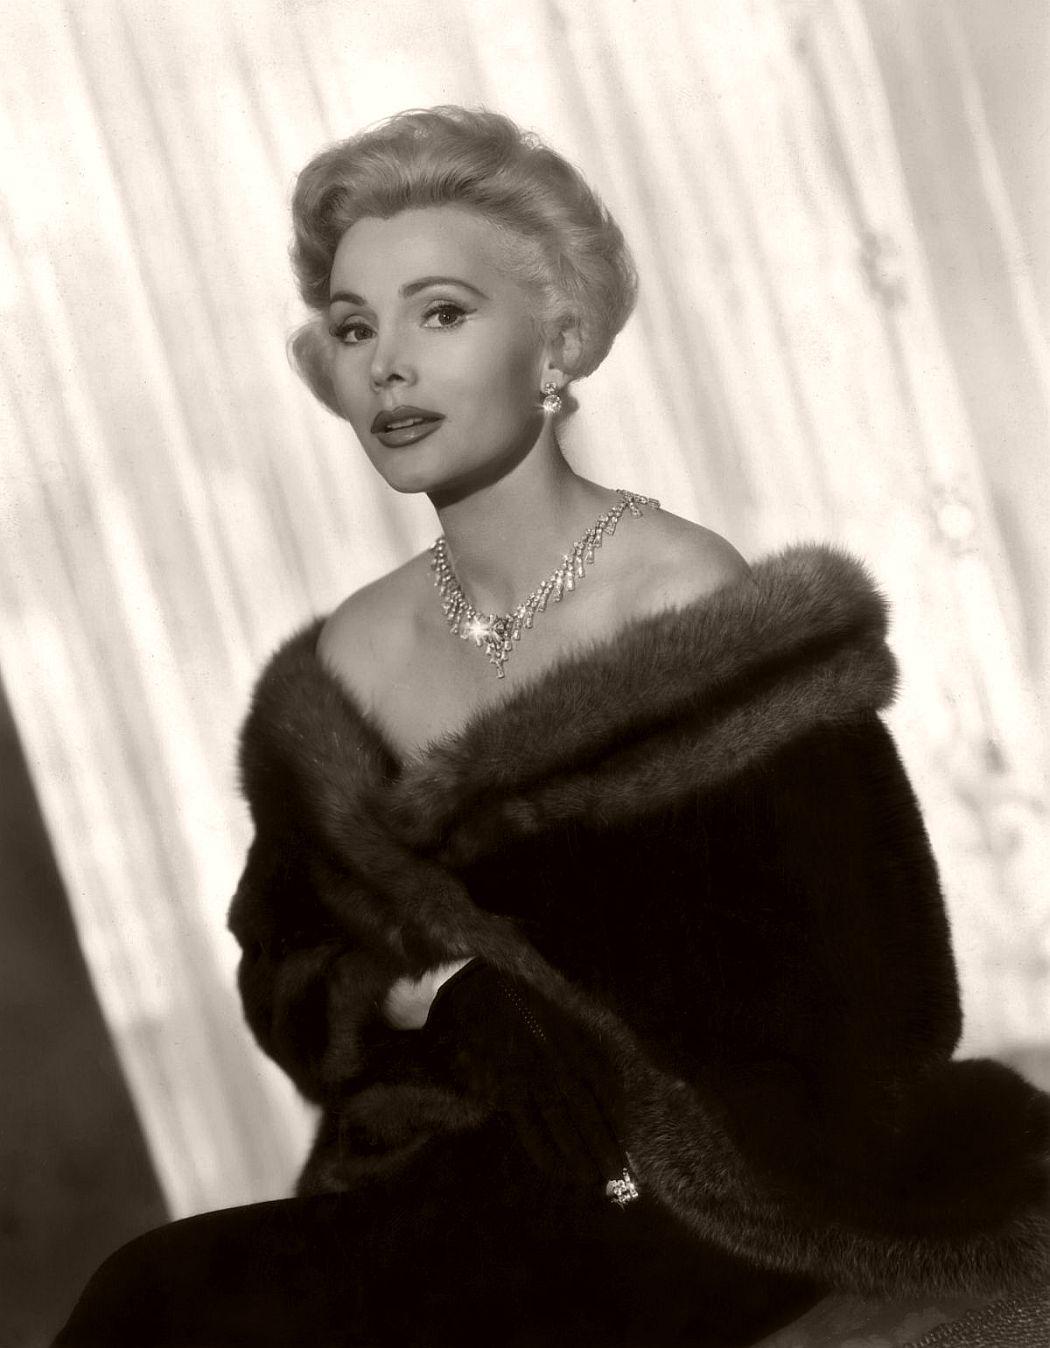 Vintage: Portraits of Zsa Zsa Gabor